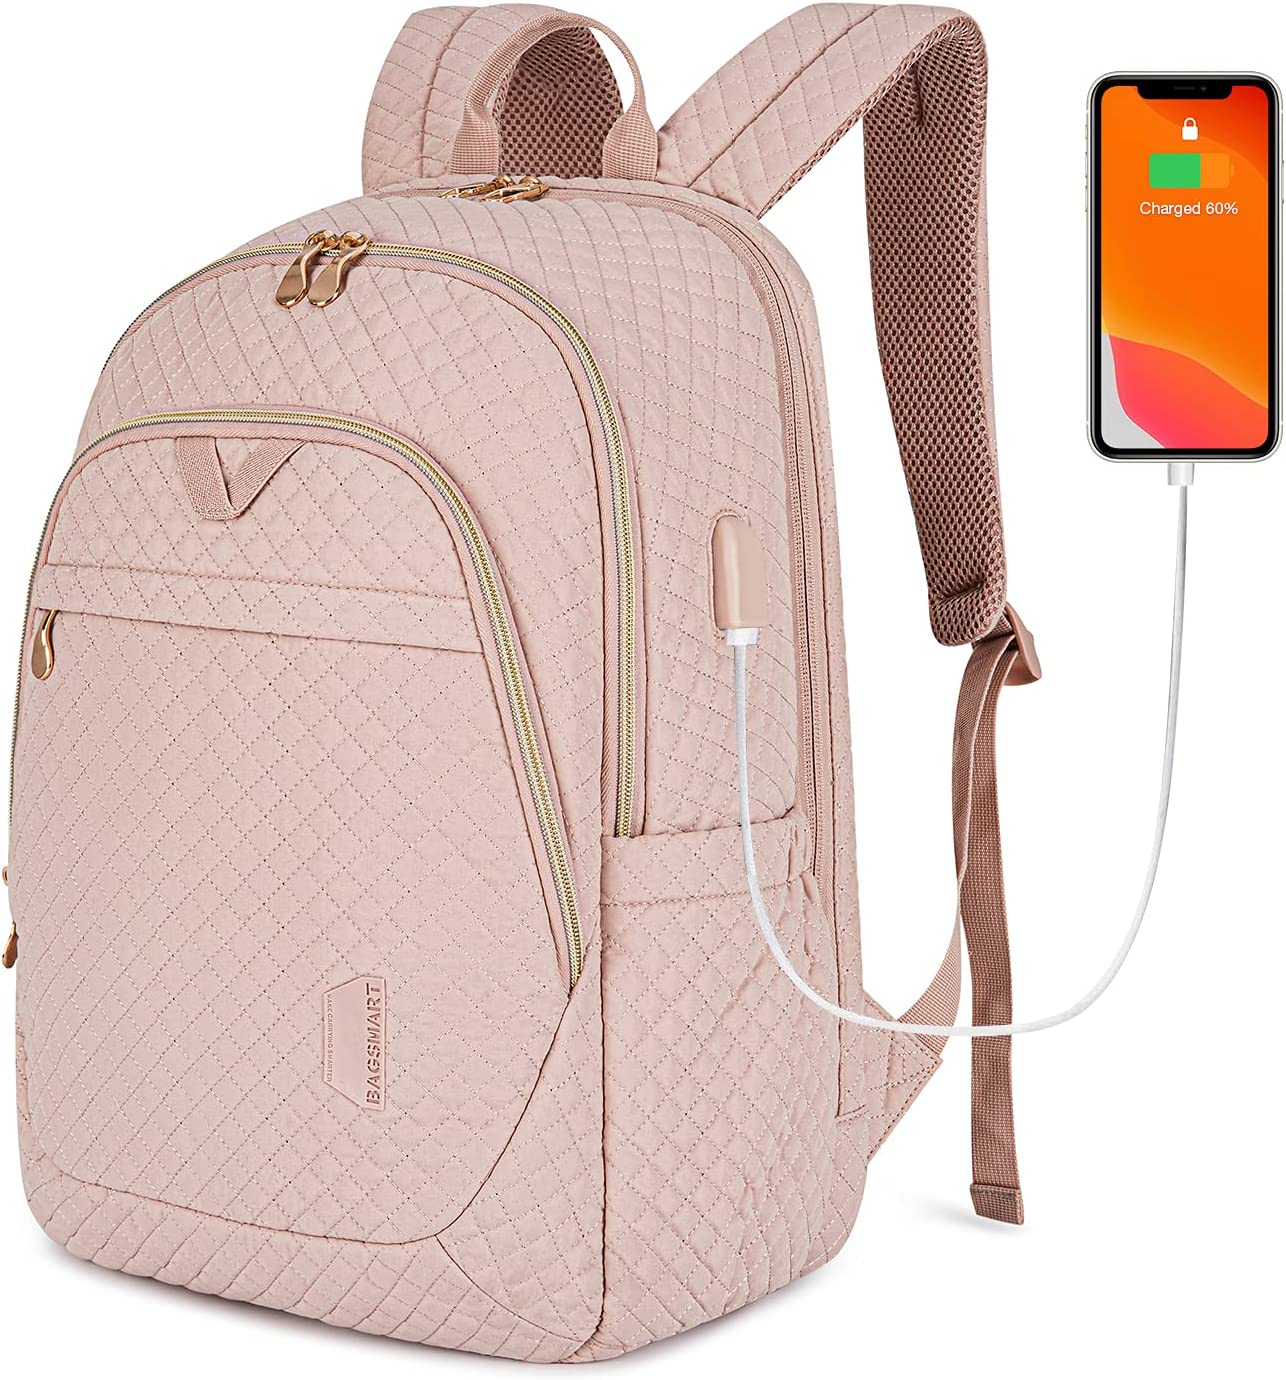 Womens Backpack BAGSMART Laptop Backpacks Travel Business with USB Charging Port 15.6 inch College School Computer Book Bag for men & women